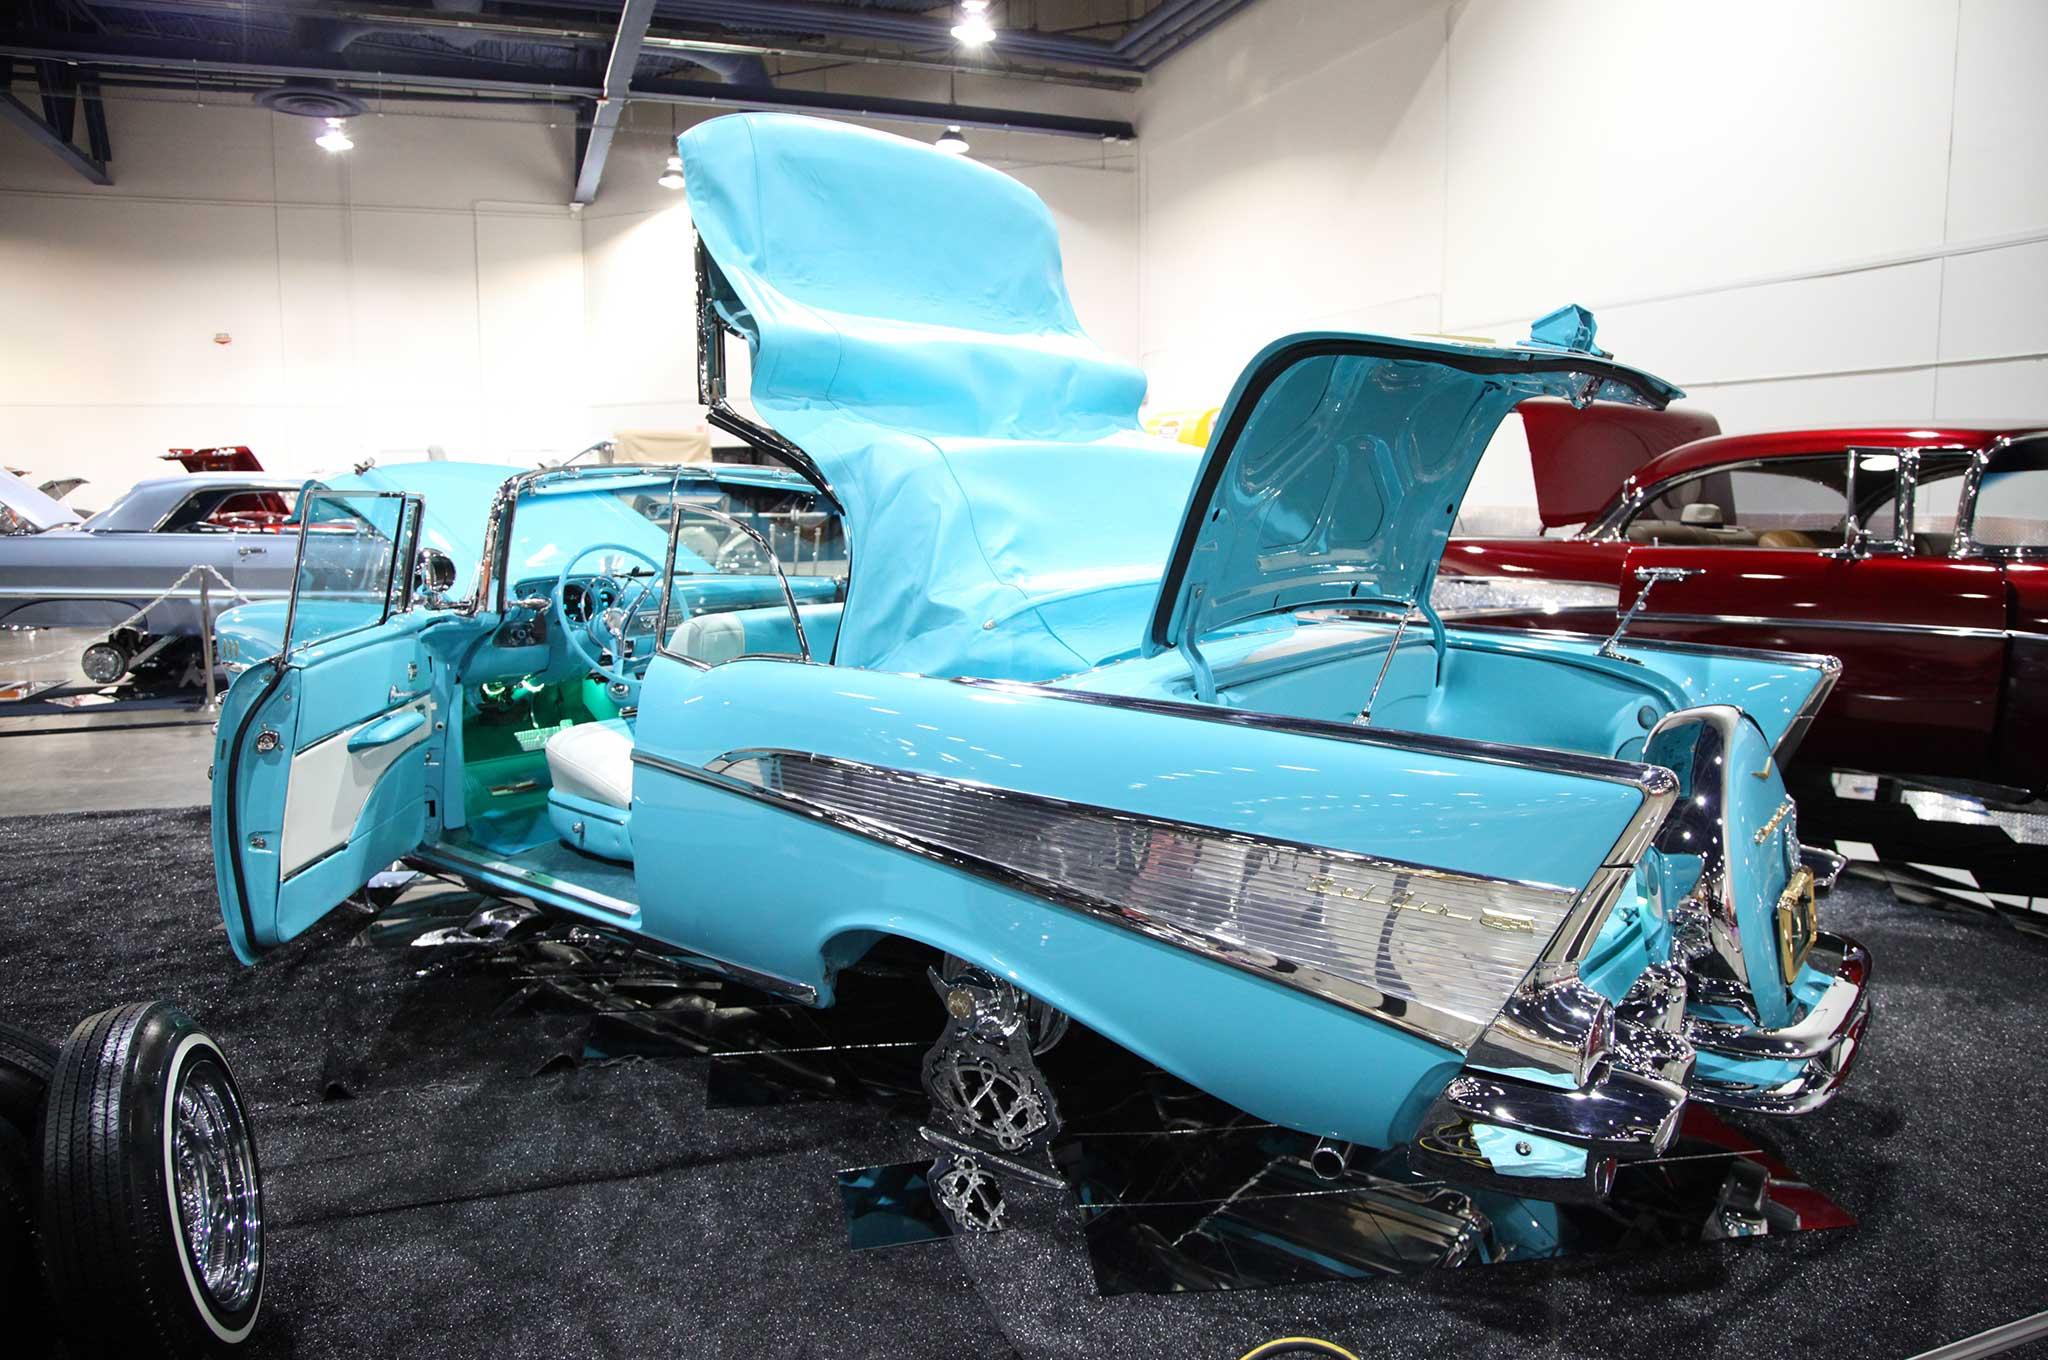 2015-las-vegas-super-show-winners-cynthia-camarena-1957-chevy-bel-air